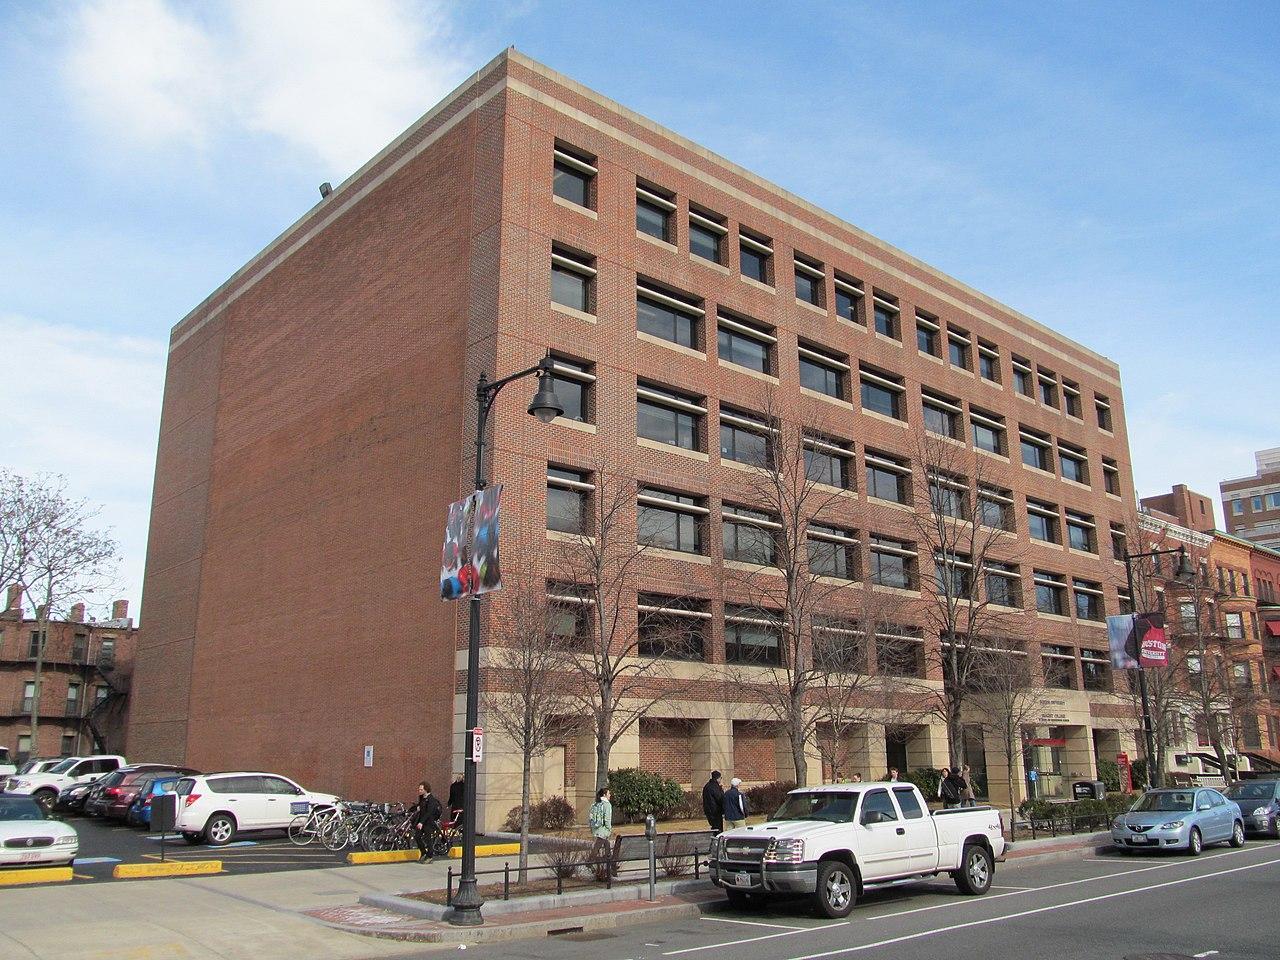 File:Sargent College, Boston University, Boston MA.jpg